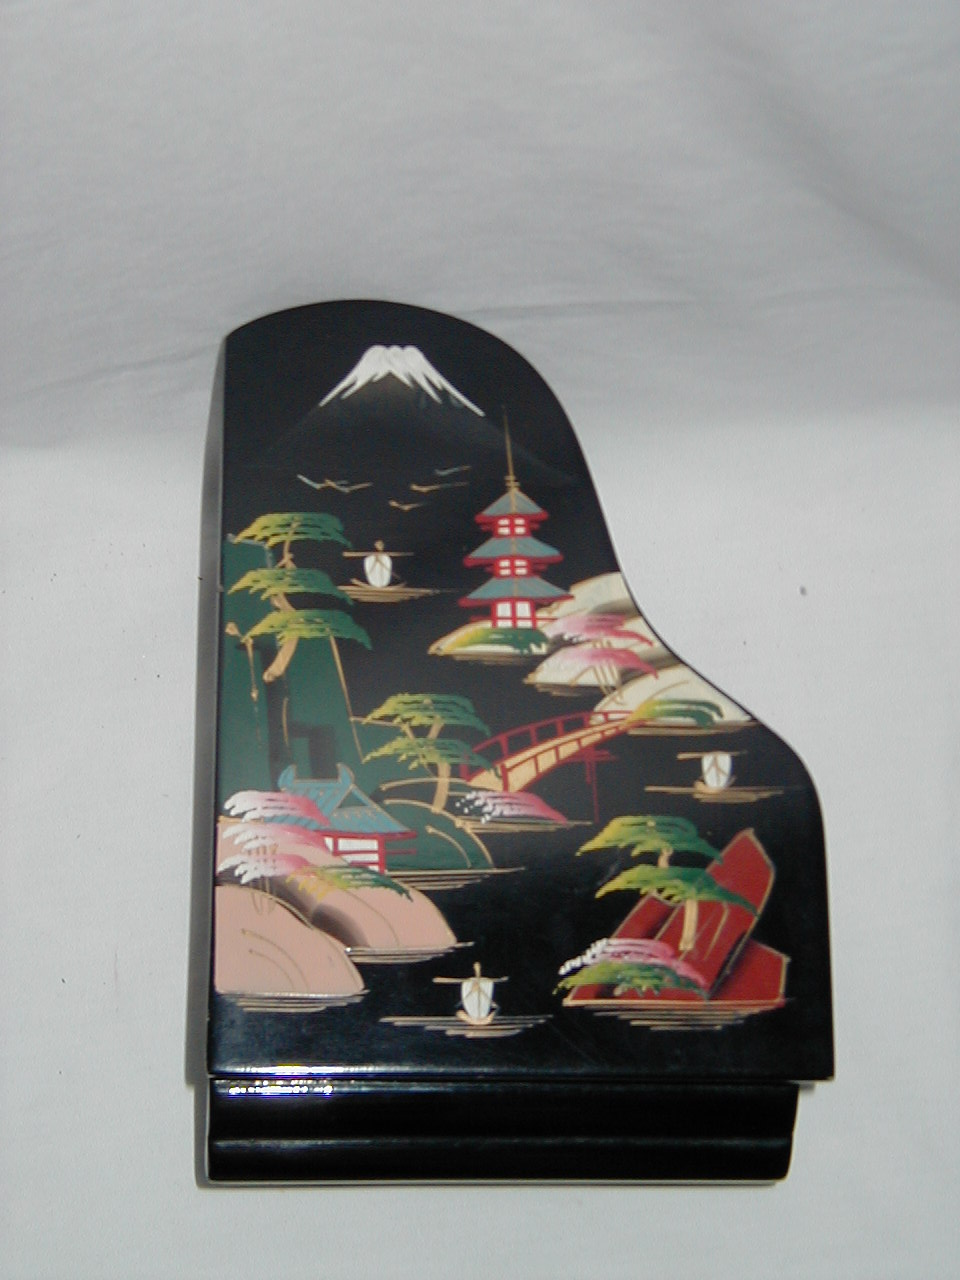 Japanese Design With Mt Fuji Pagoda Bridge In Piano Form